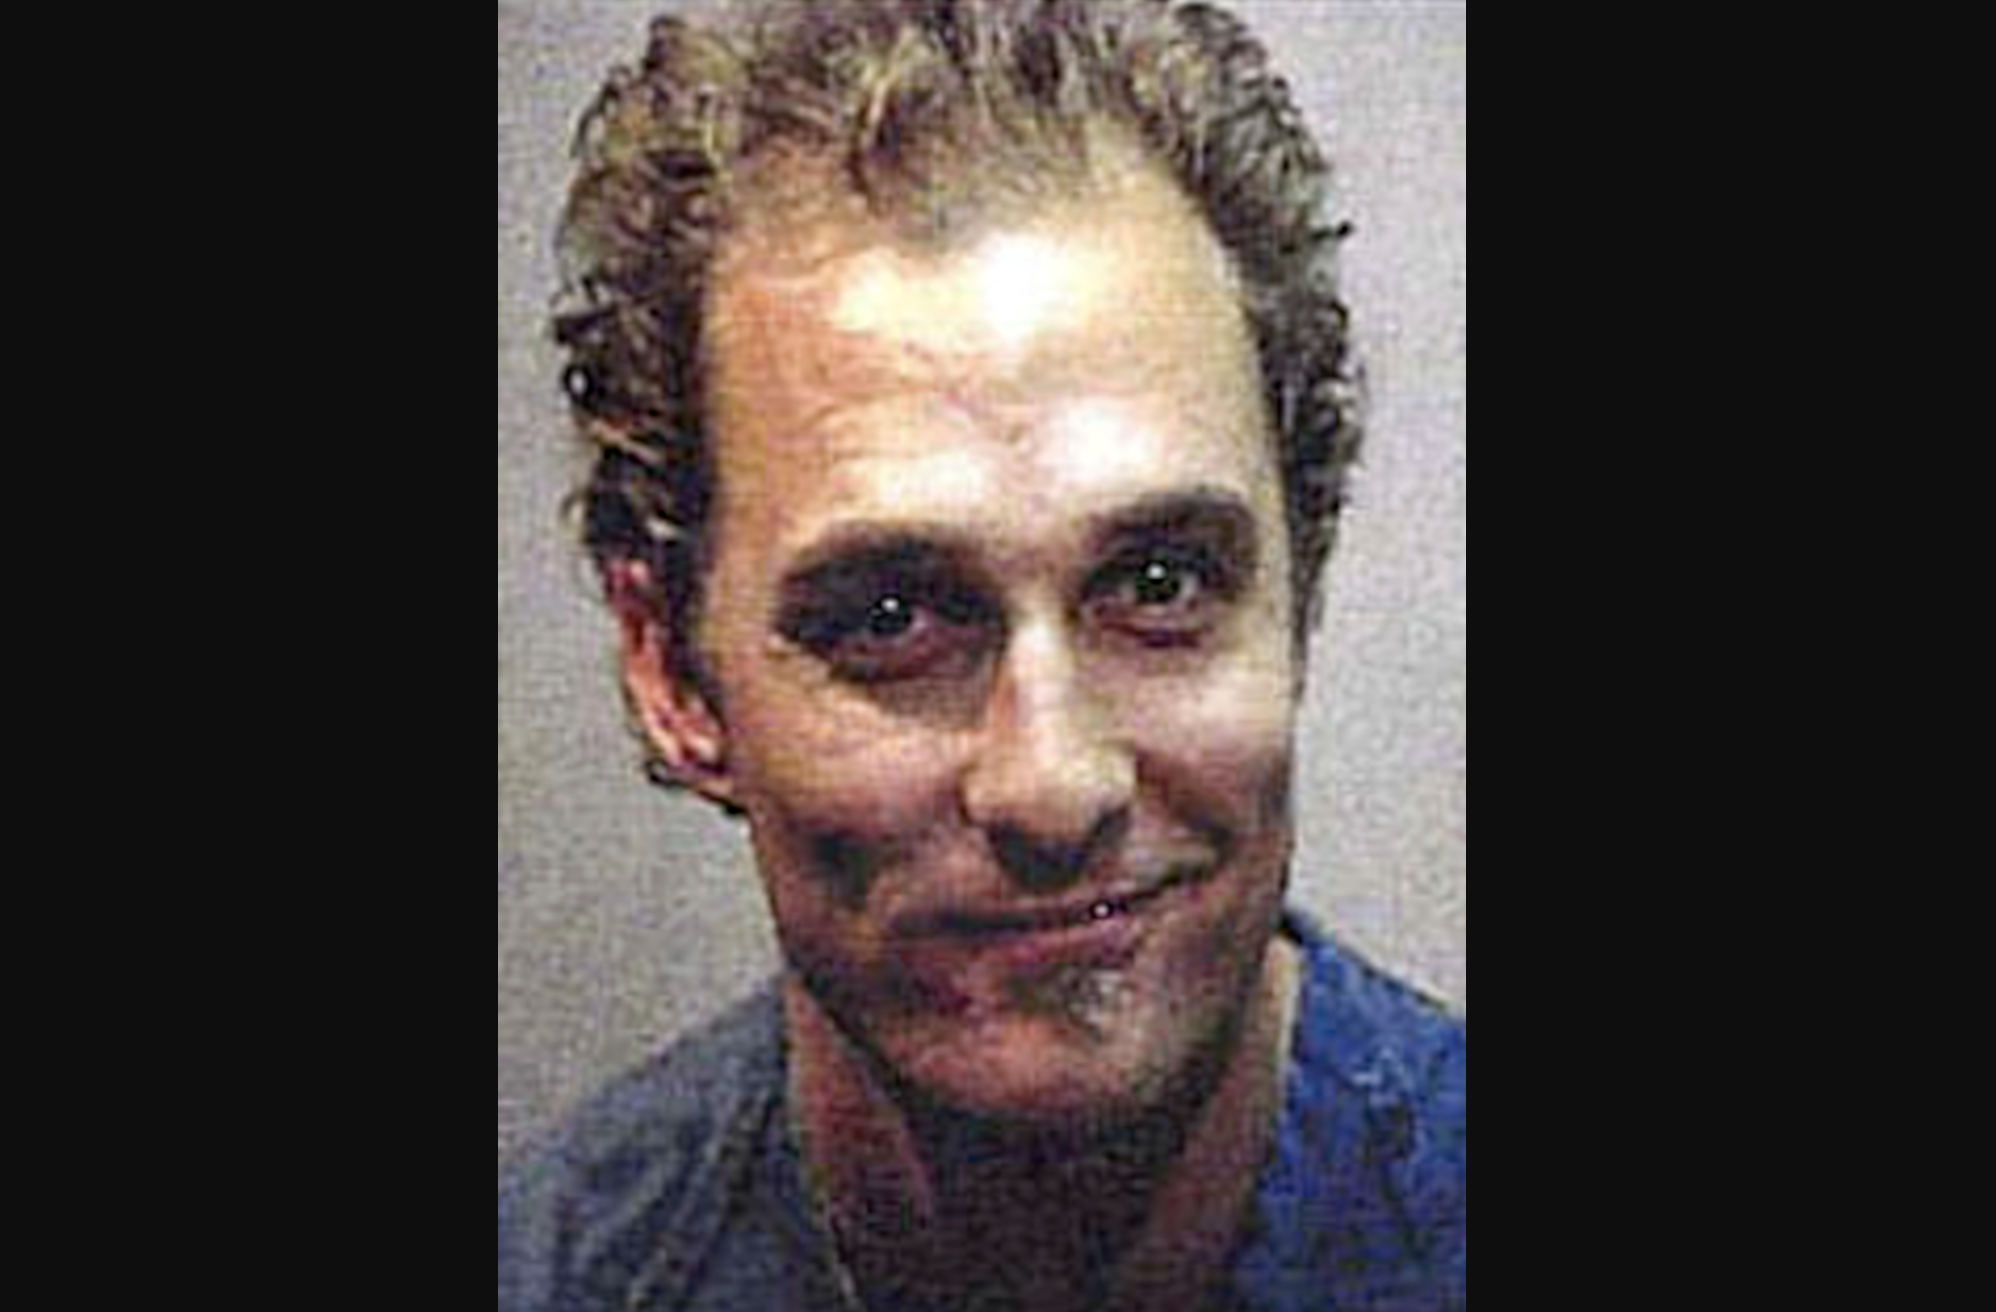 Matthew McConaughey on his 1999 nude bongo arrest: F**k